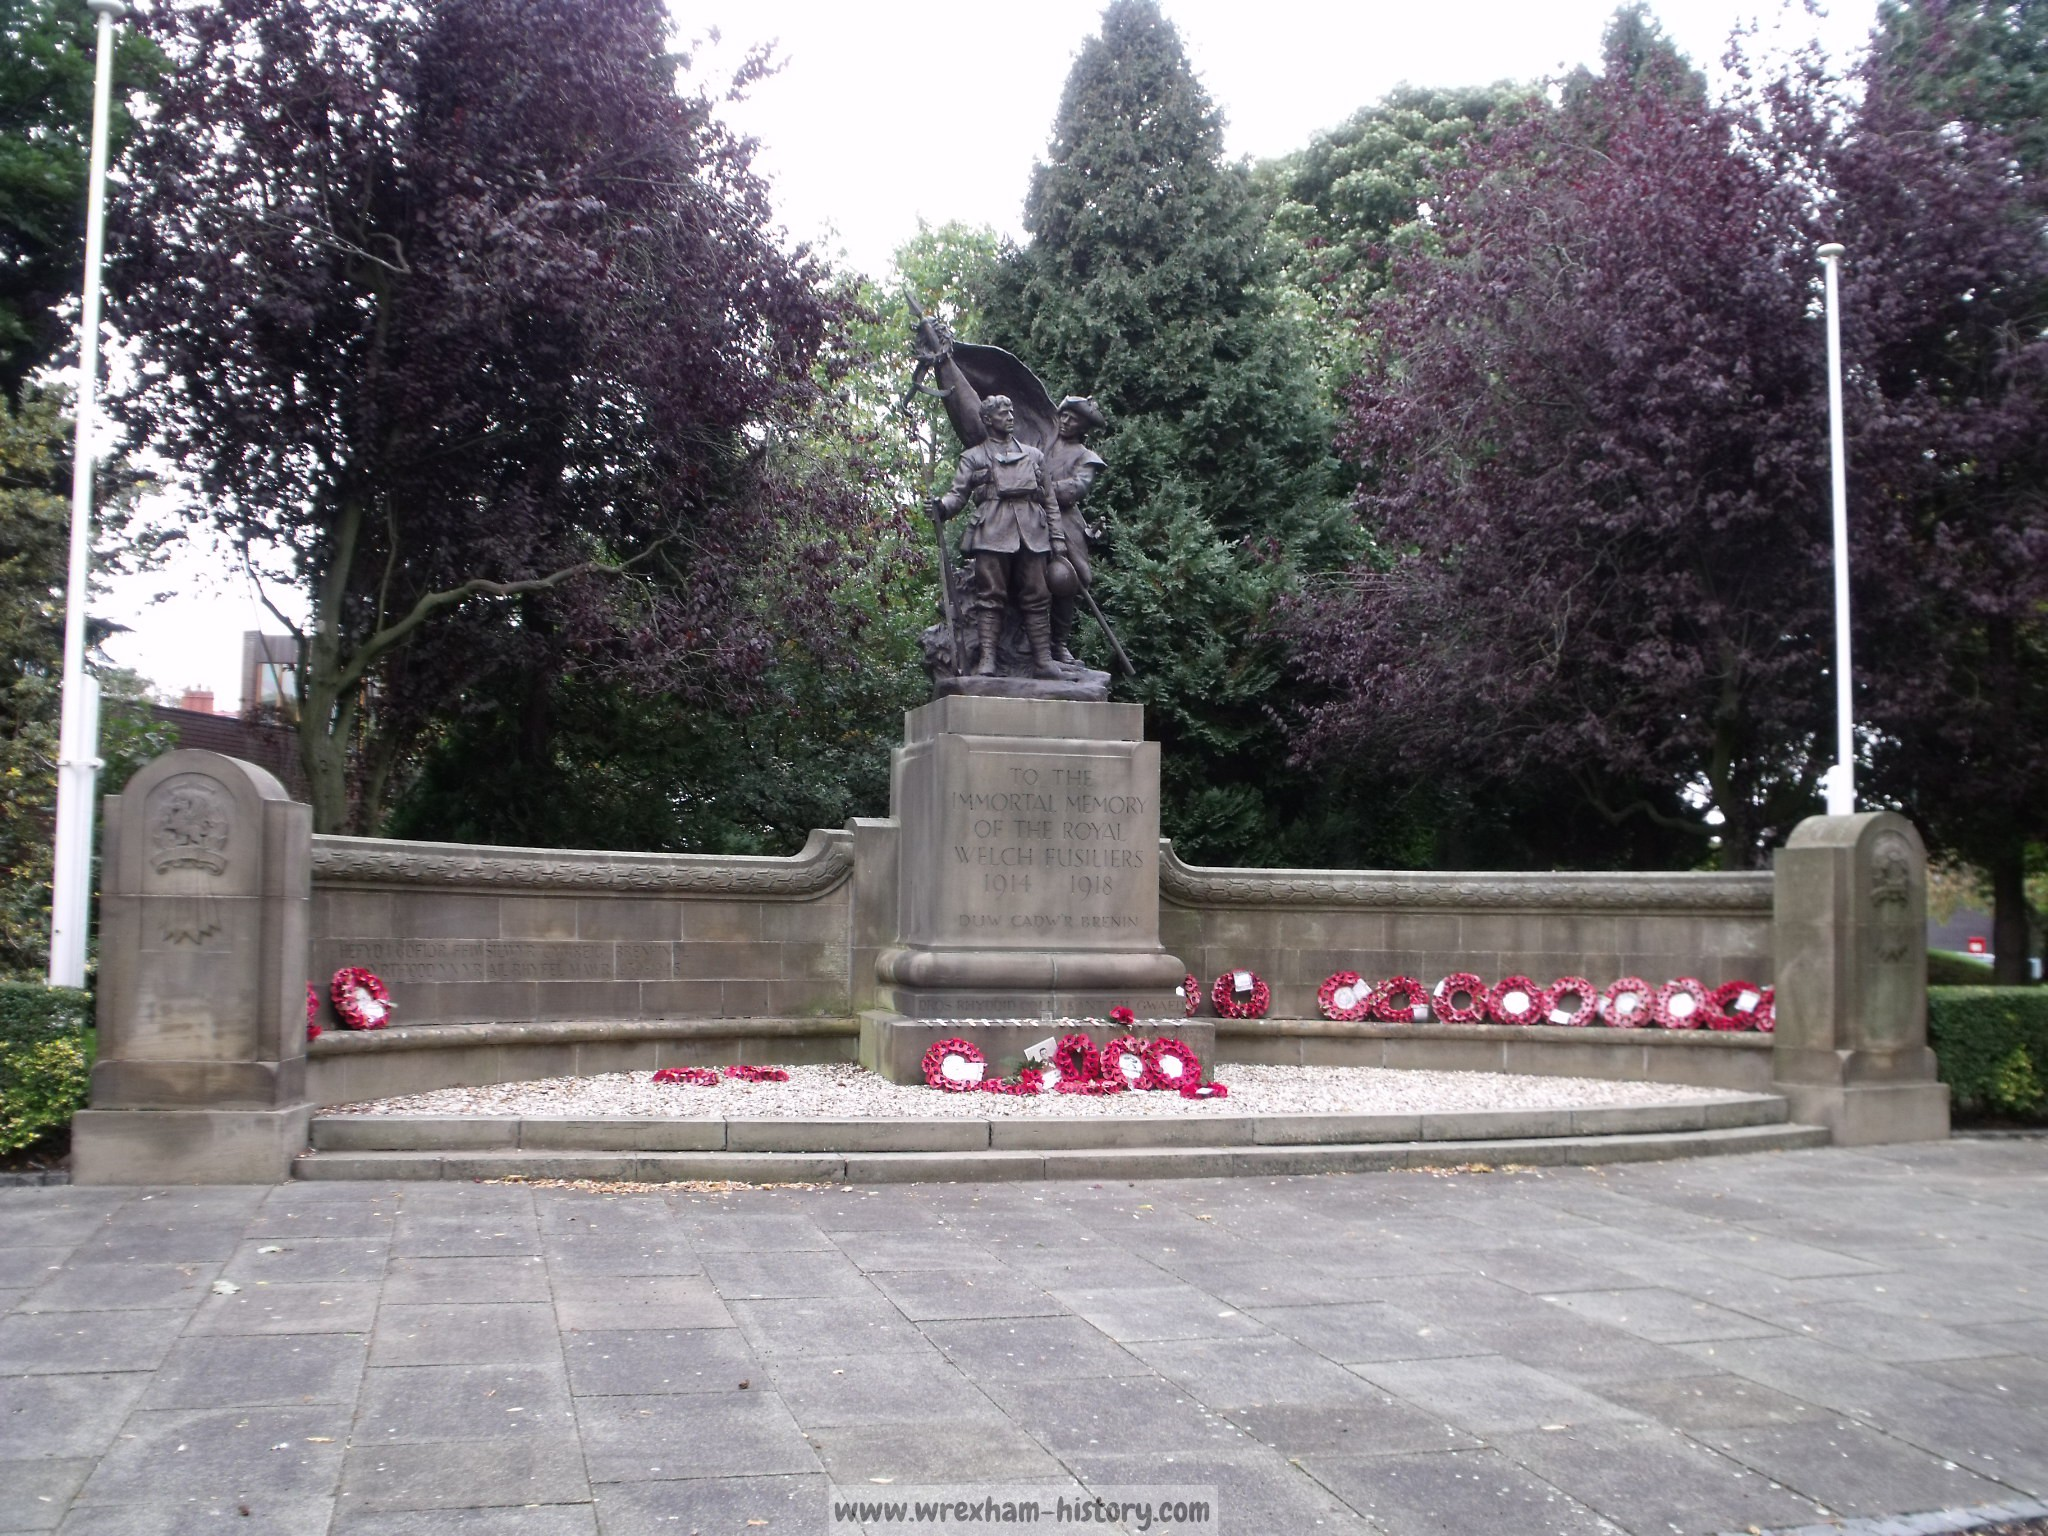 Wrexham War Memorial